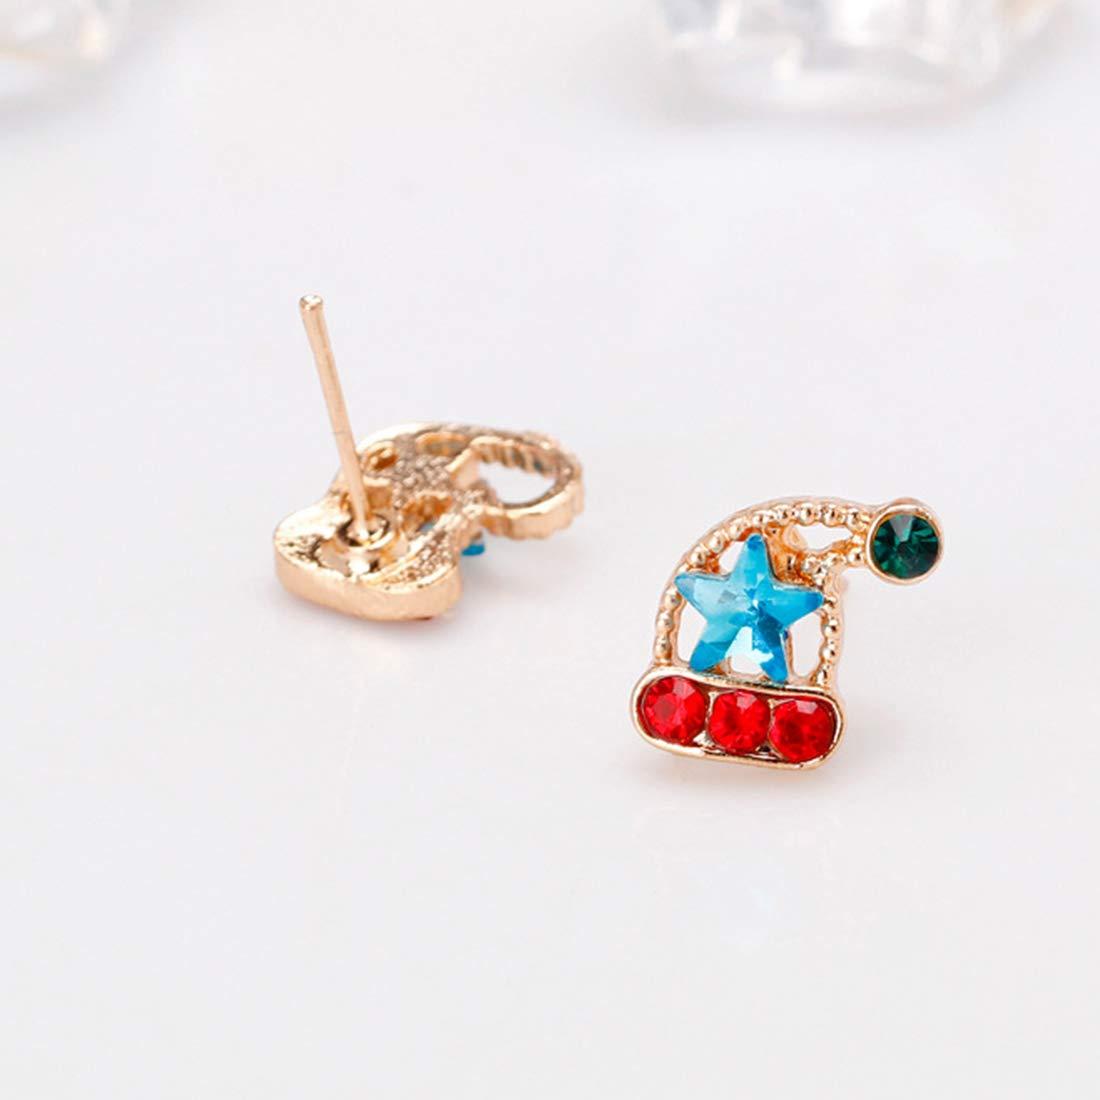 Stocking + Hat Shinelin Christmas Earrings Crystal CZ Enamel Ear Studs for Women Girls Kids Holiday Xmas Festive Gift